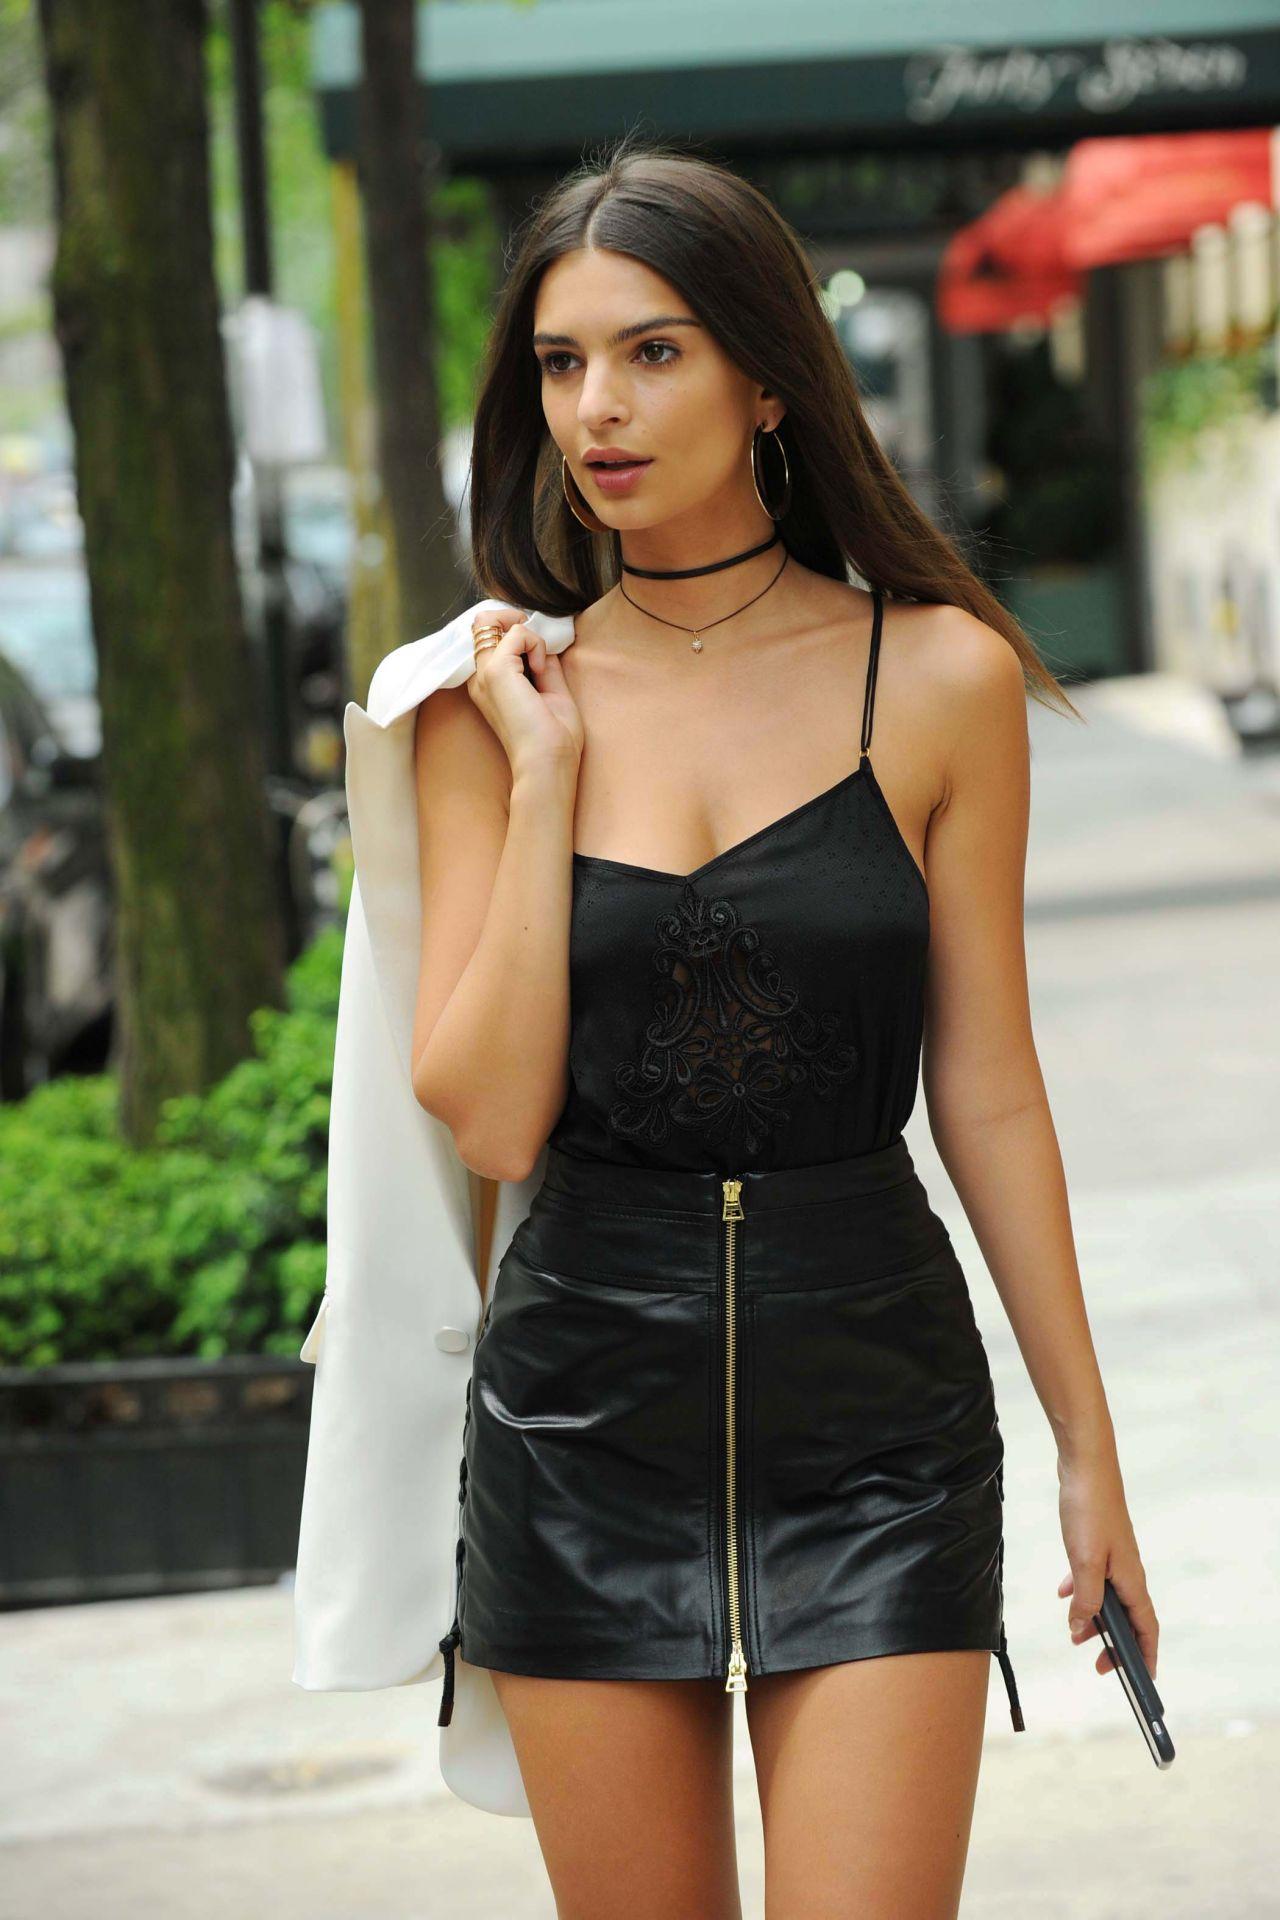 c28dac8e5662 Emily Ratajkowski Chic Street Style - New York City